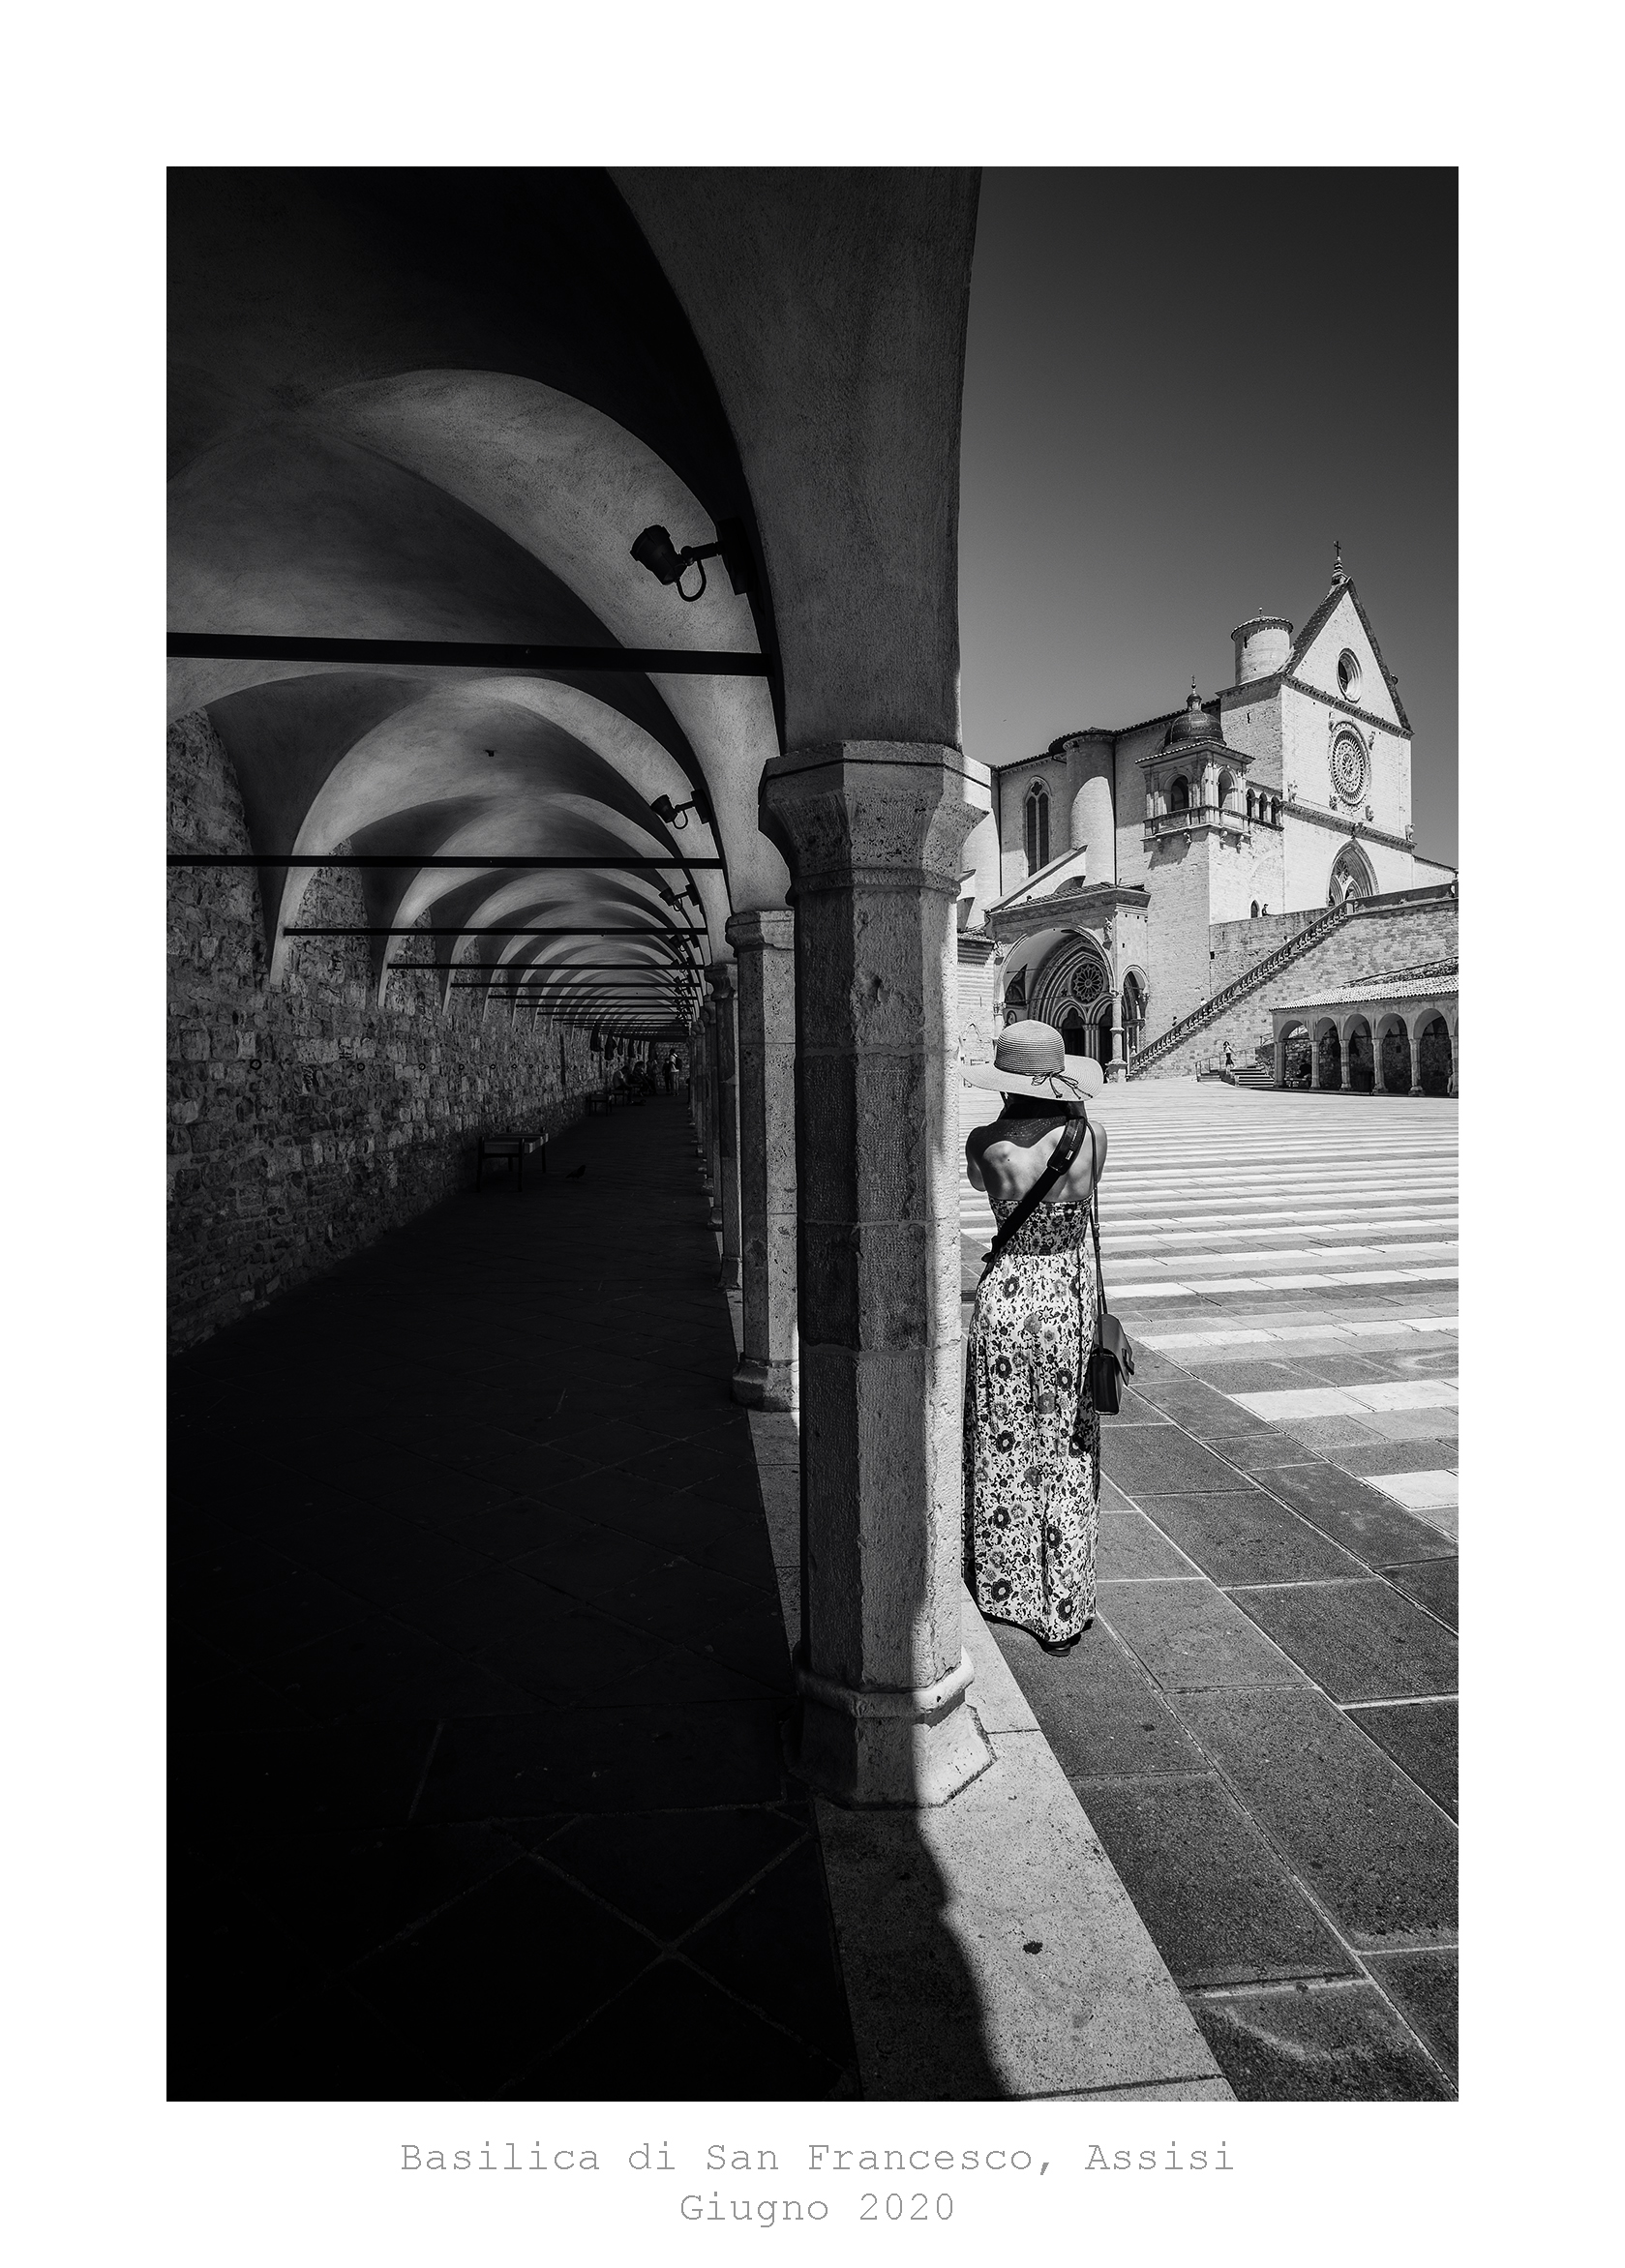 St. Francis Basilica, Assisi...